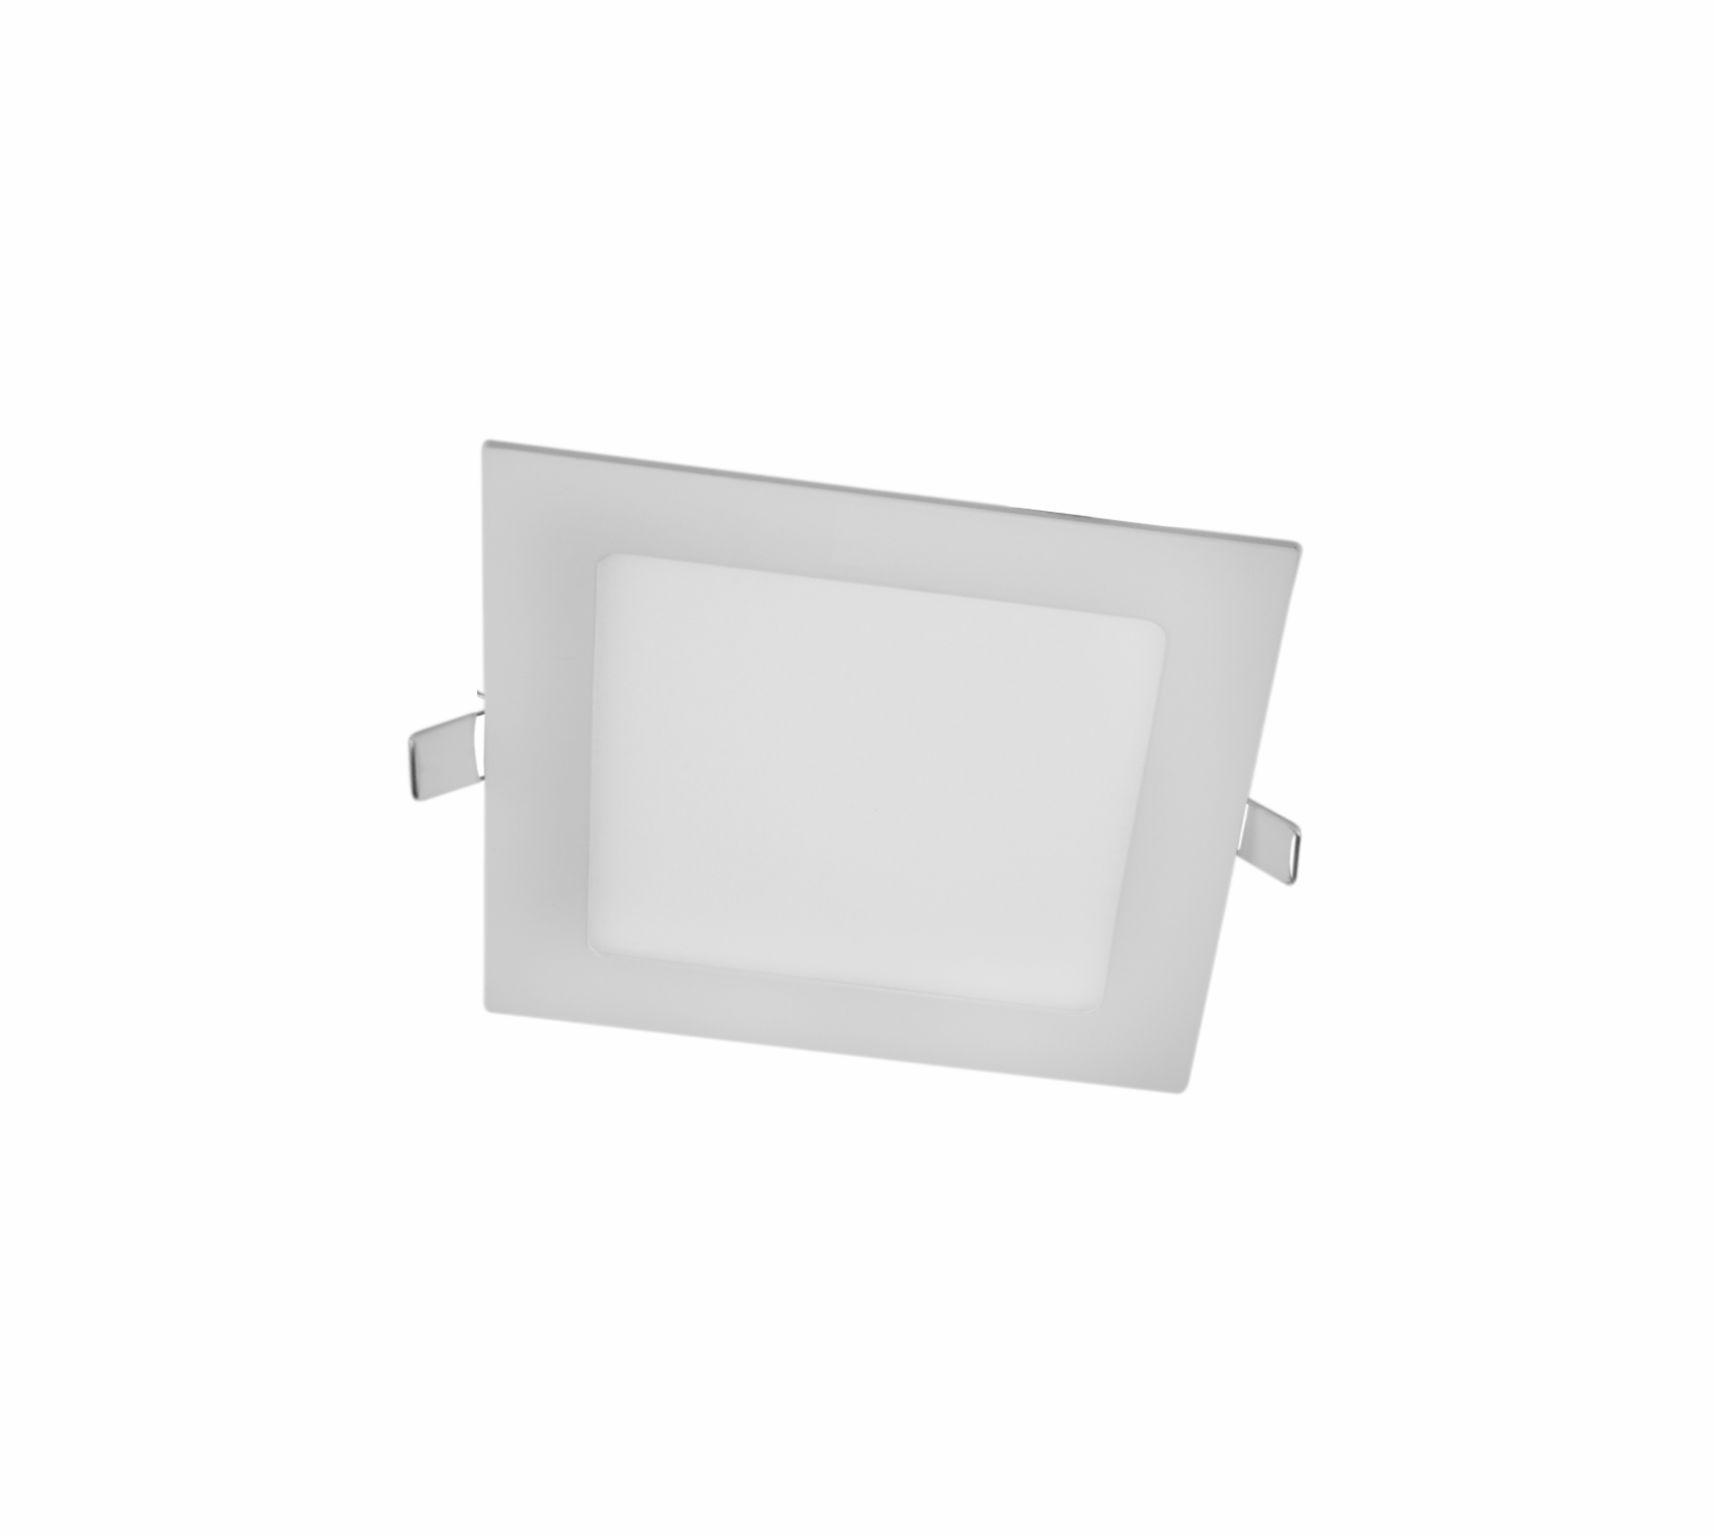 PAINELSLIMLED-PROJETO-QD-E-120-18-40-3C <span>(caixa)</span><br/>